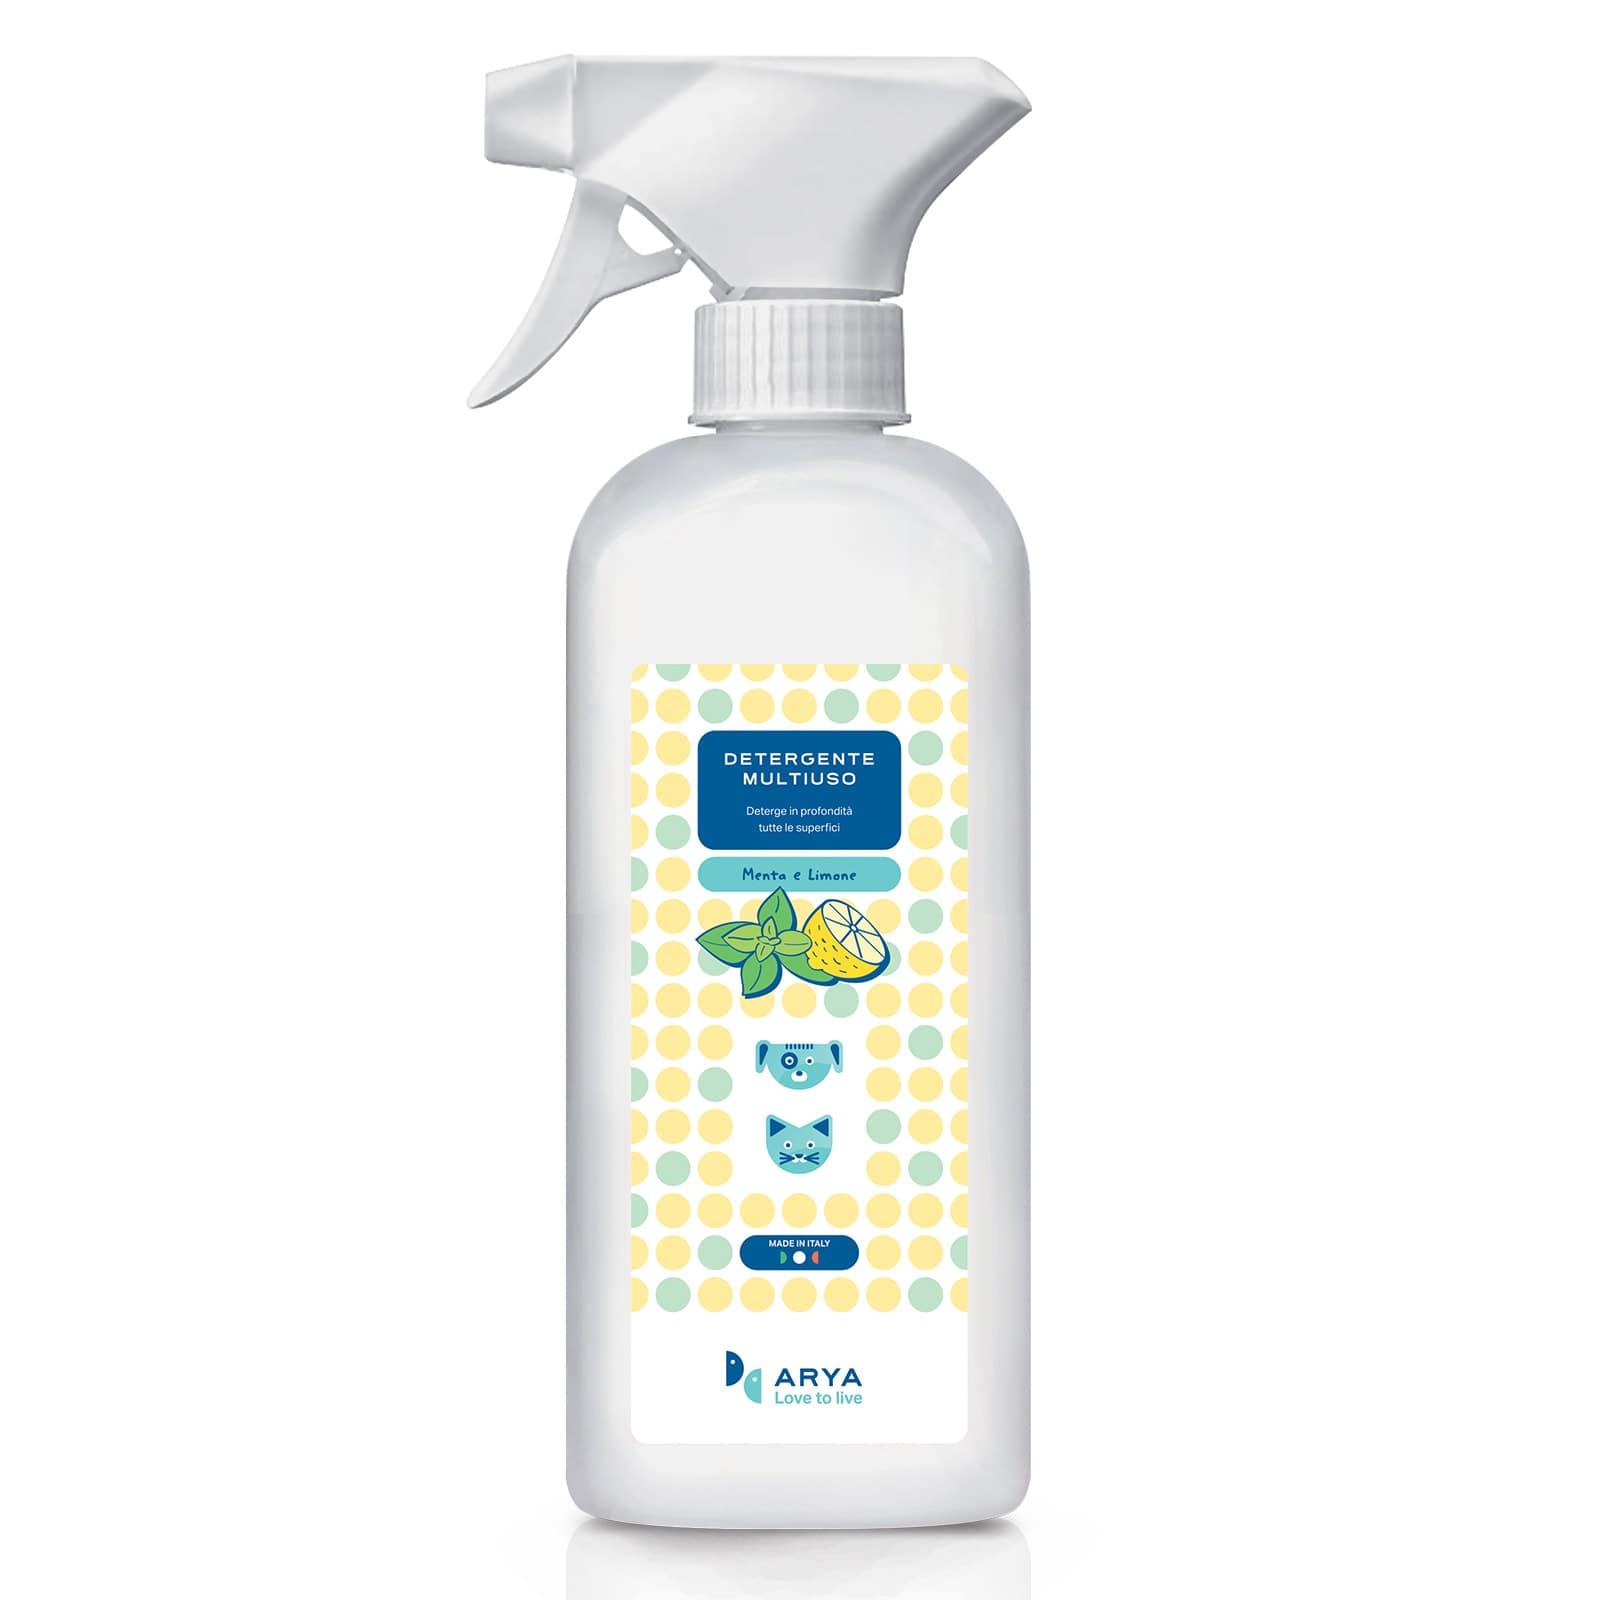 Detergente multiuso